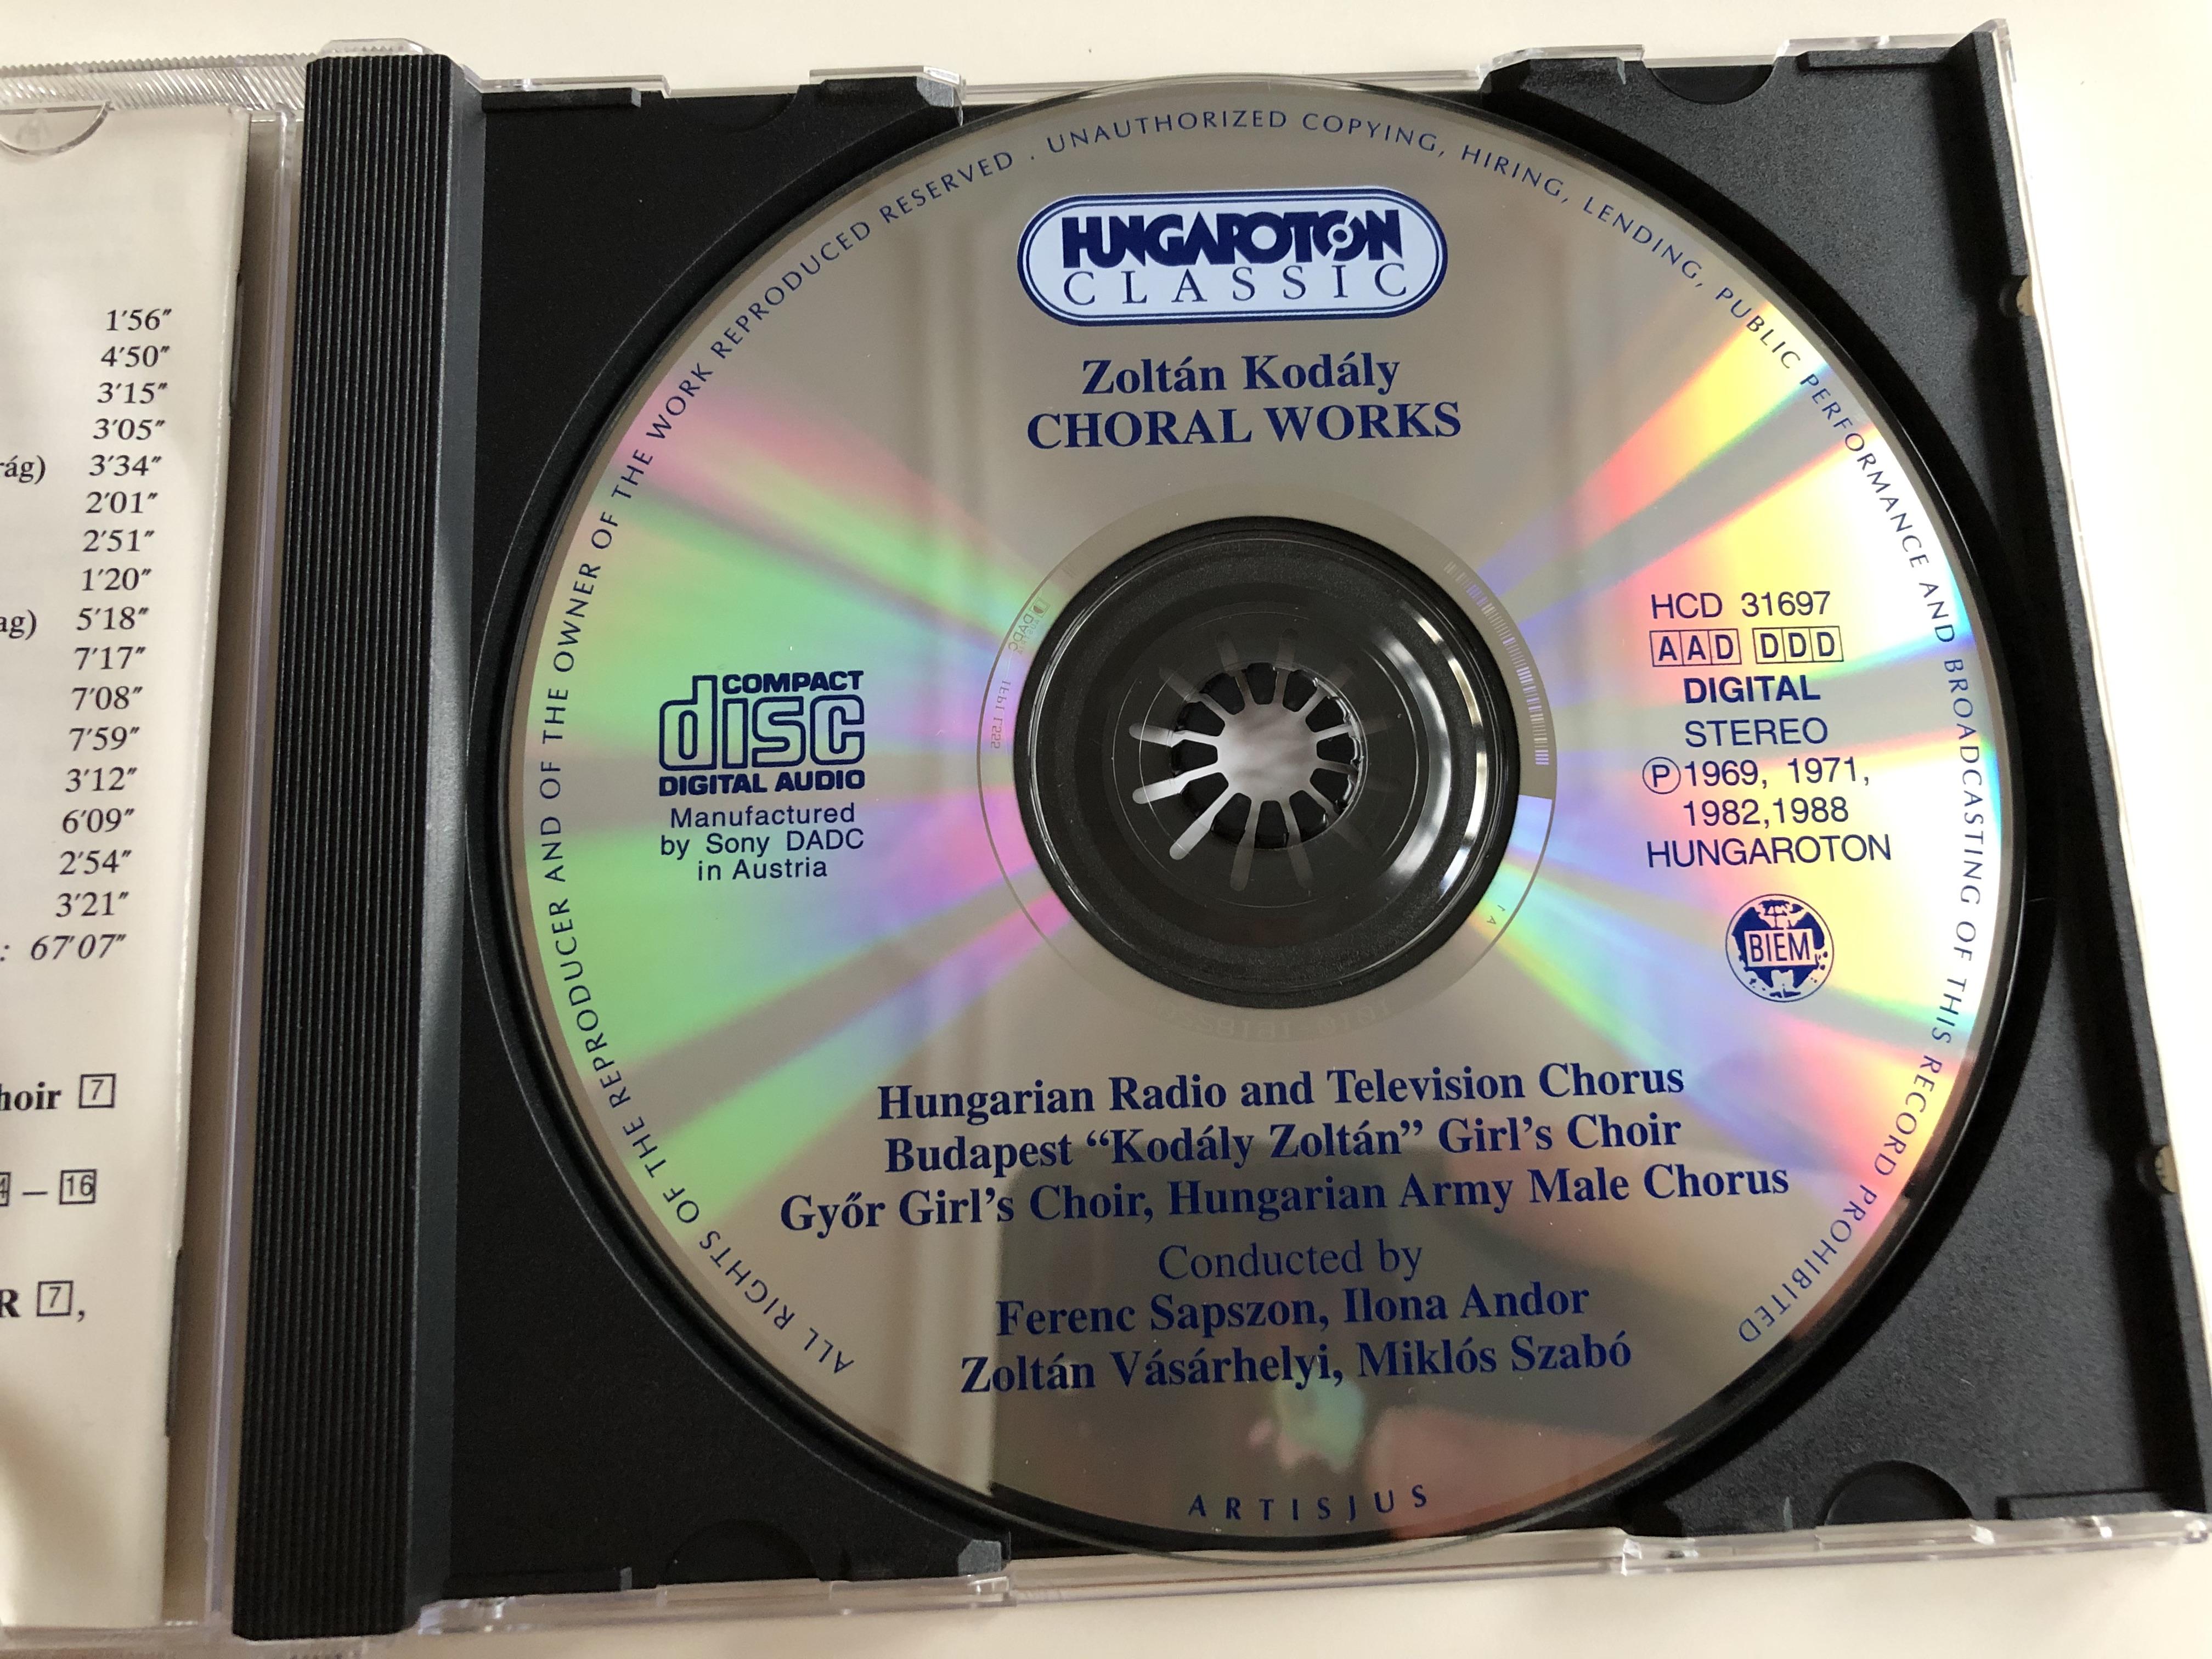 kod-ly-choral-music-vol.-3-audio-cd-1997-a-magyarokhoz-nemzeti-dal-moh-cs-liszt-ferencnek-hungarian-rtv-chorus-budapest-kod-ly-girl-s-choir-gy-r-girls-choir-hungarian-army-male-chorus-conductors-ferenc-sapszon-il-6488180-.jpg